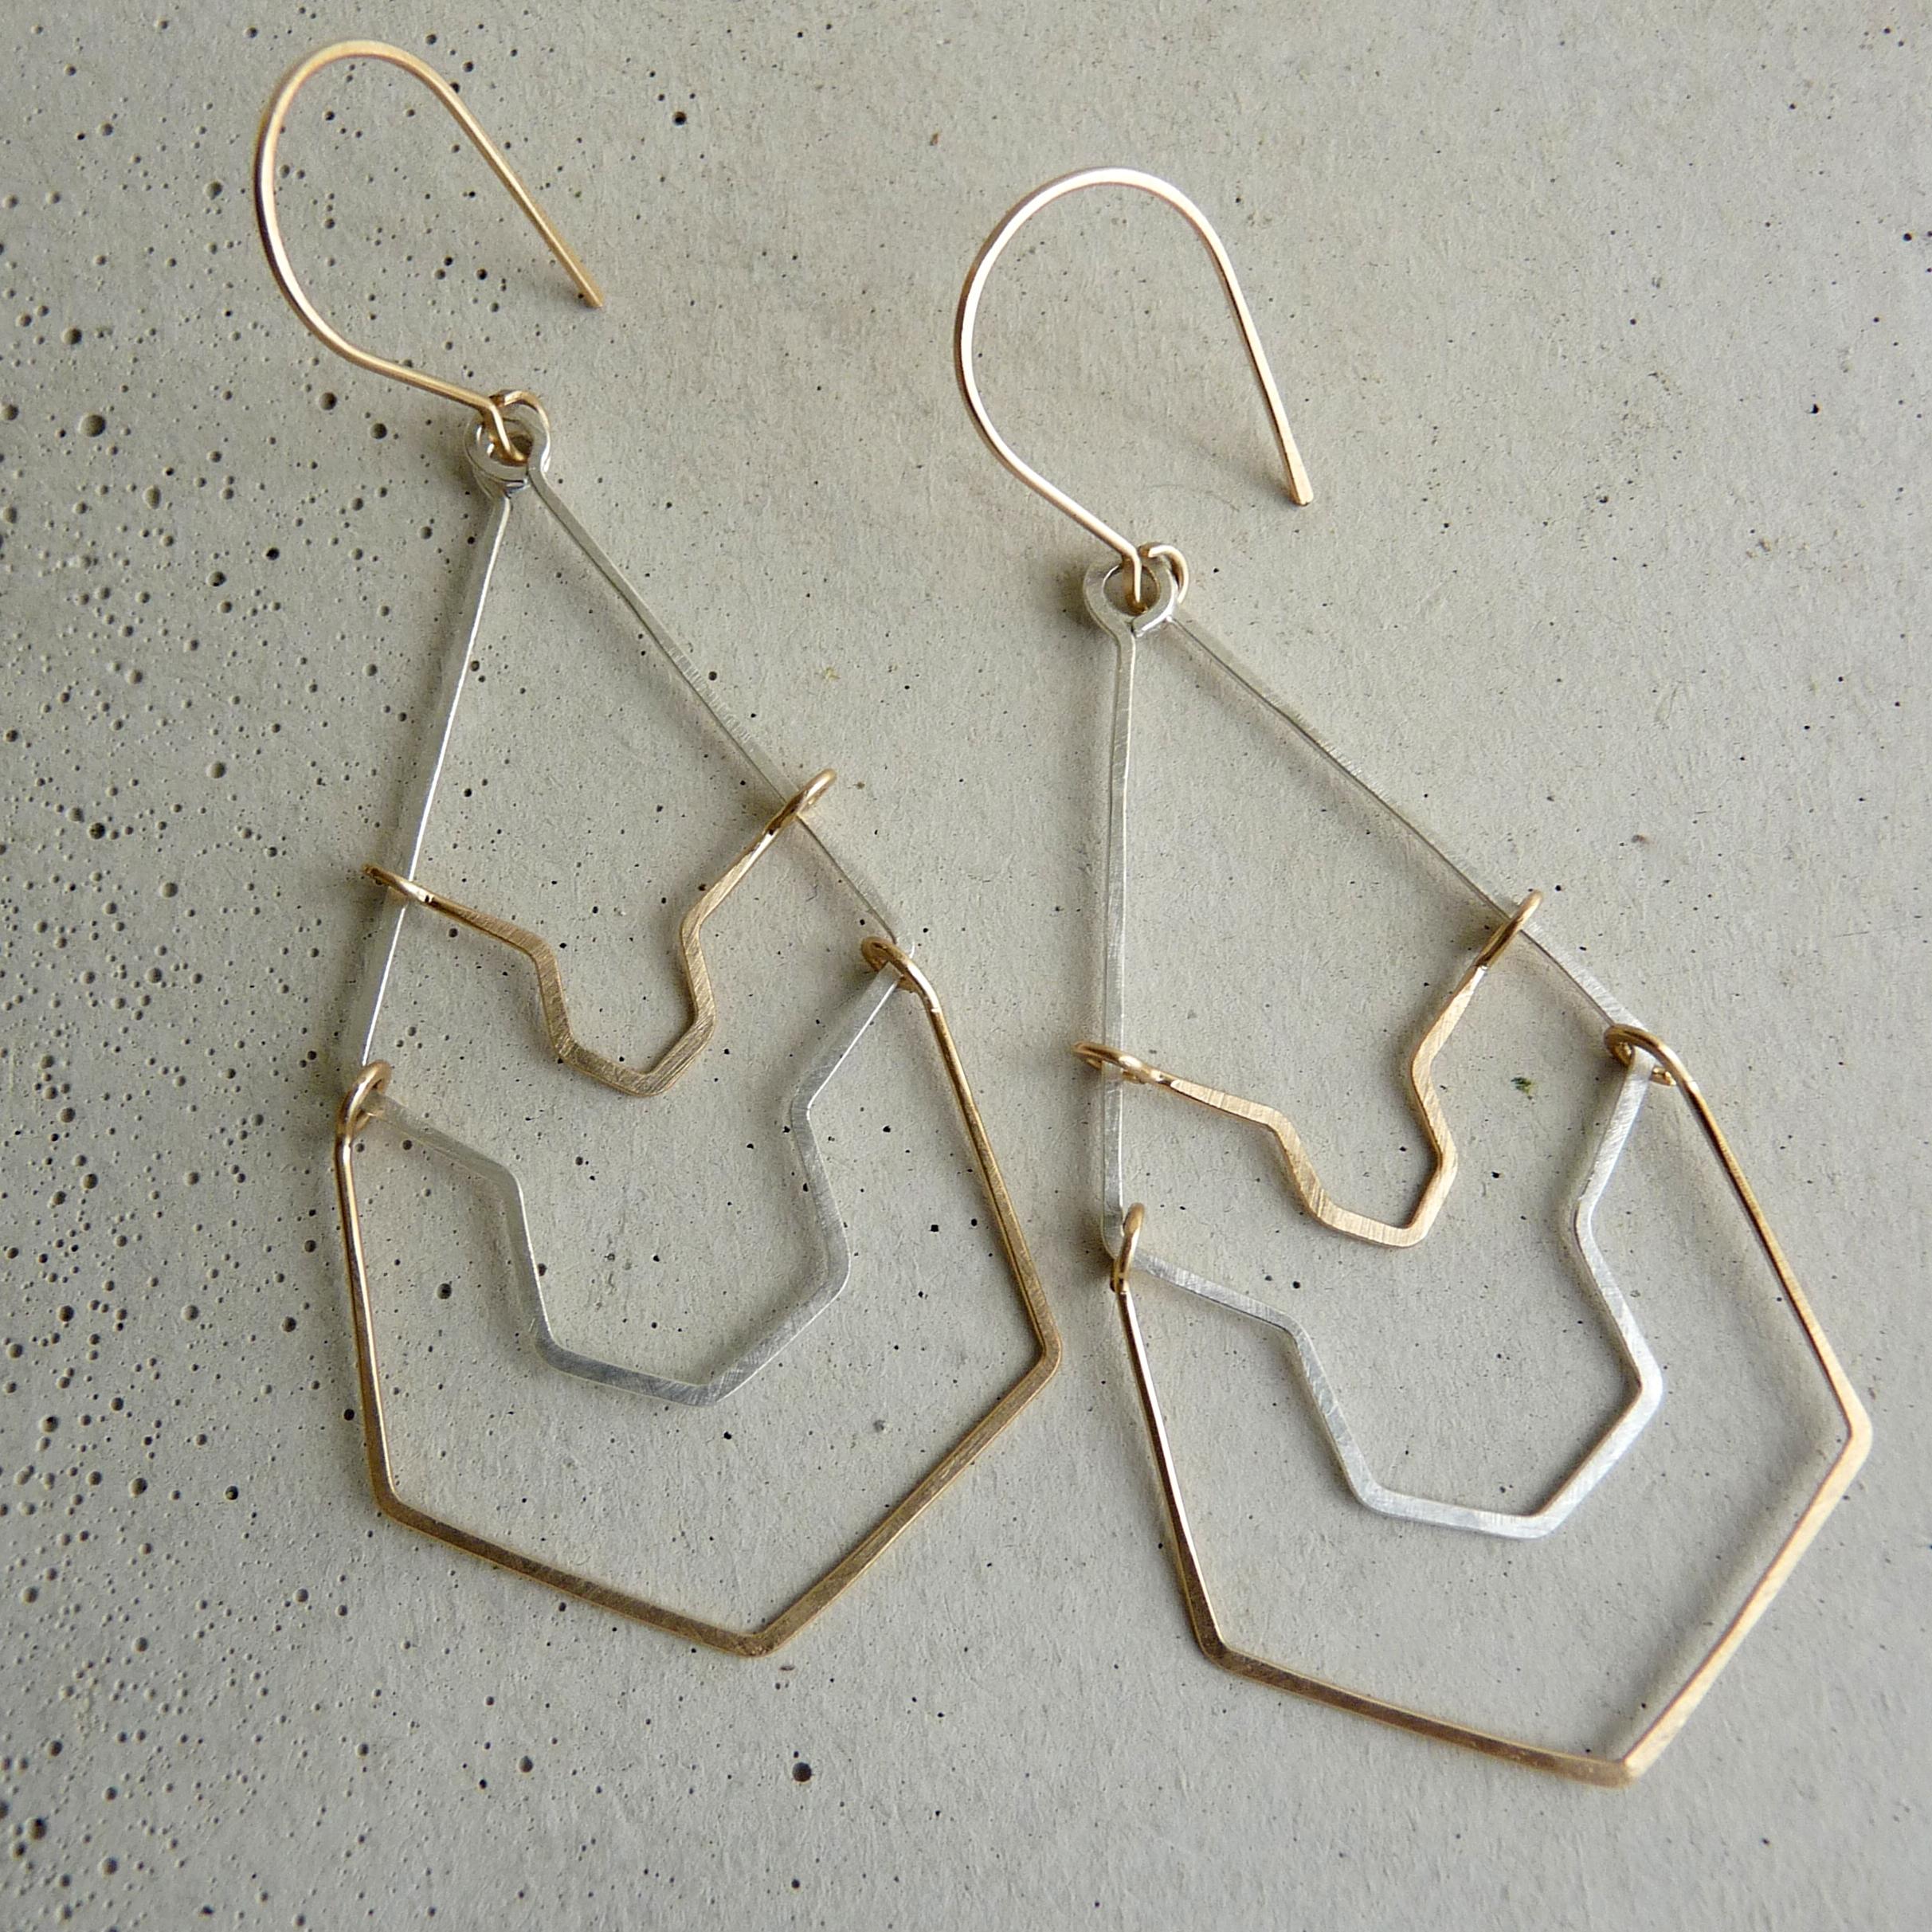 KARST earrings, long geometric earrings, bridal earrings, bridesmaid earrings, wedding jewelry, gold and silver long earrings, new refined basics, 2014 shifting seasons